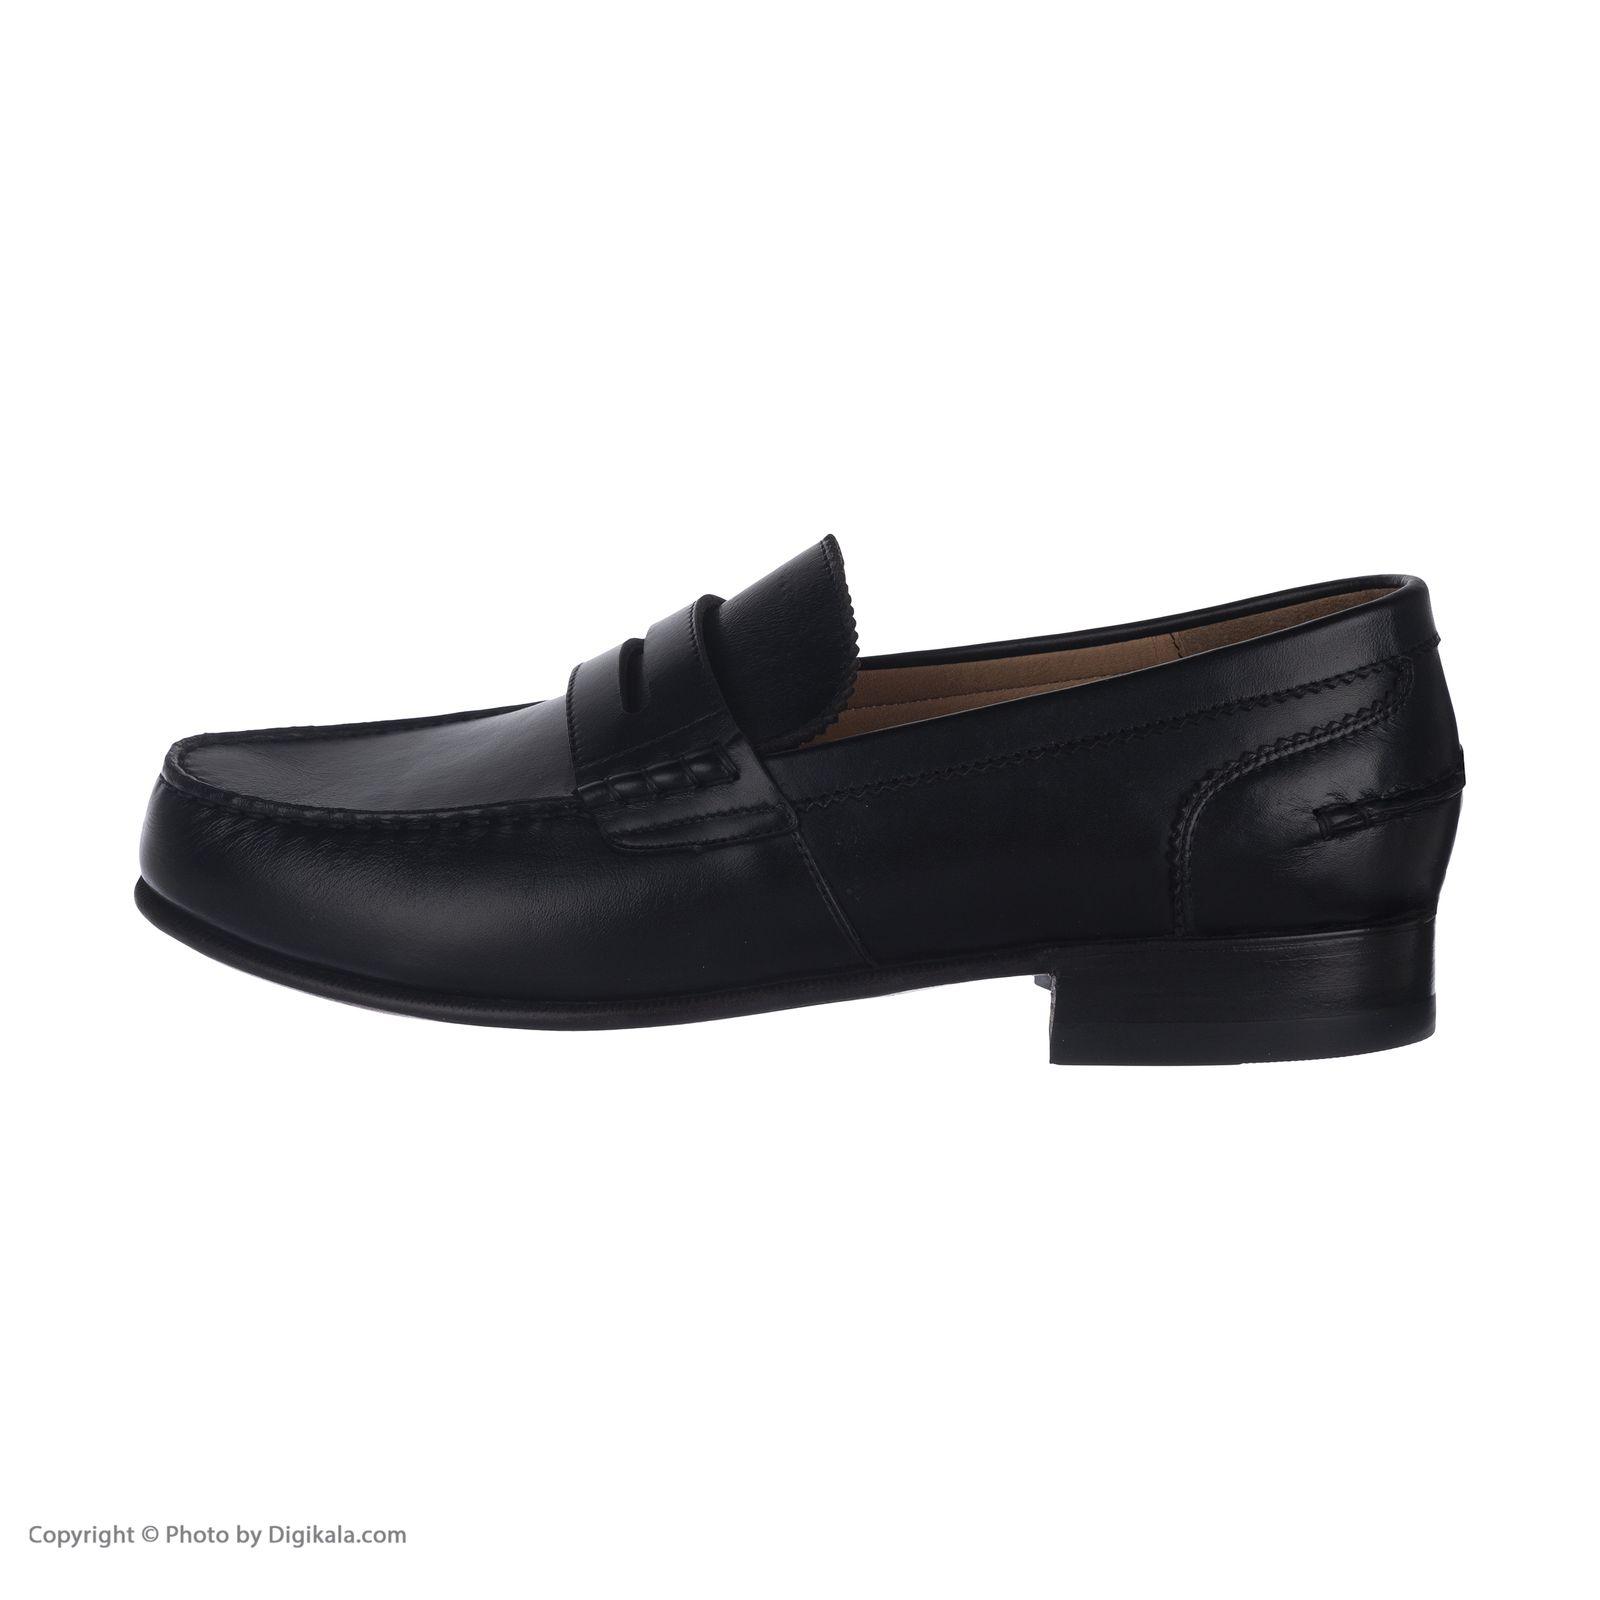 کفش مردانه نظری کد 410 -  - 1